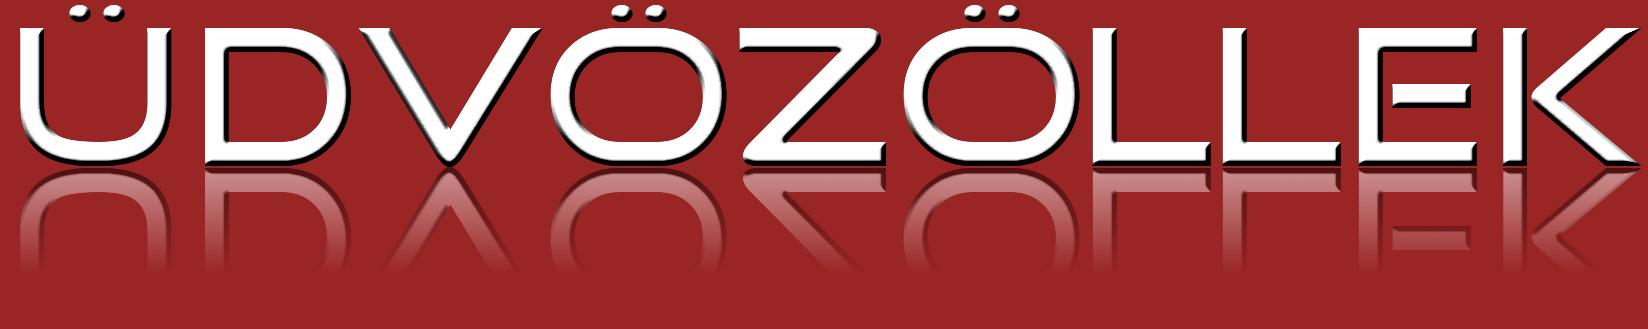 coollogo_com-129403799